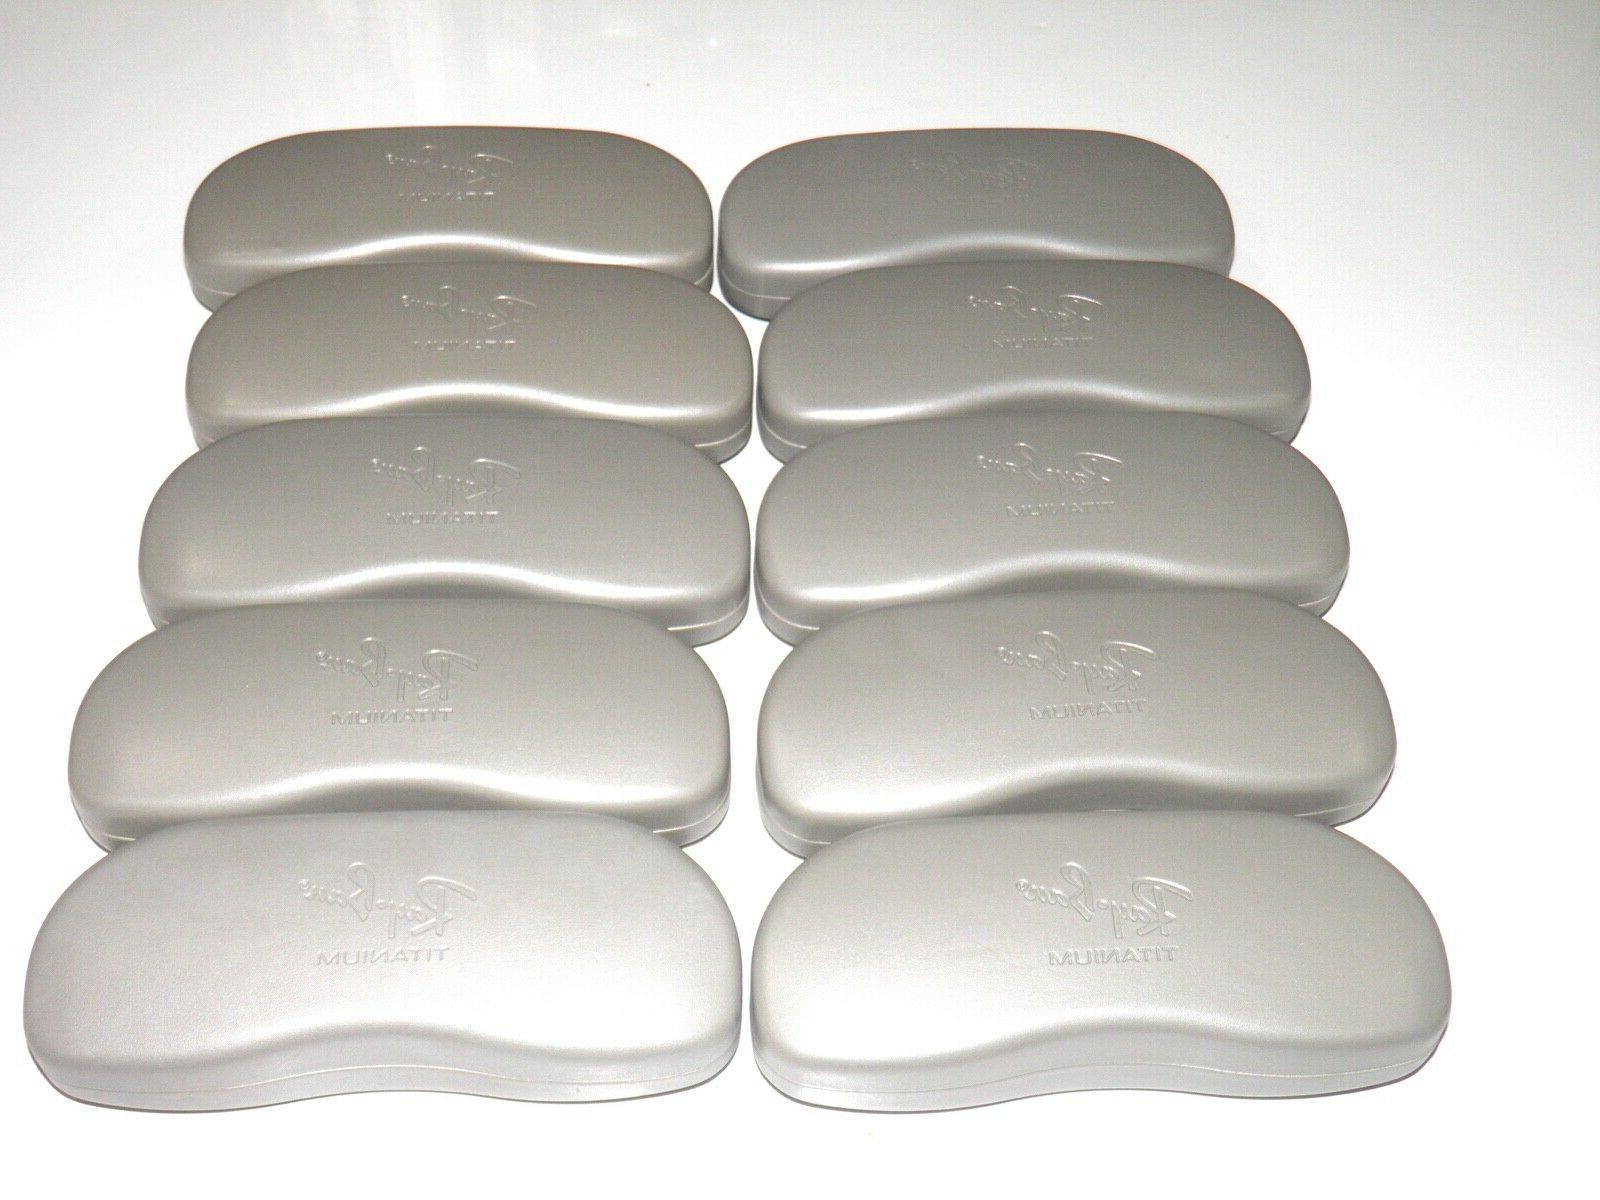 rayban gray eyeglasses hard cell case lot